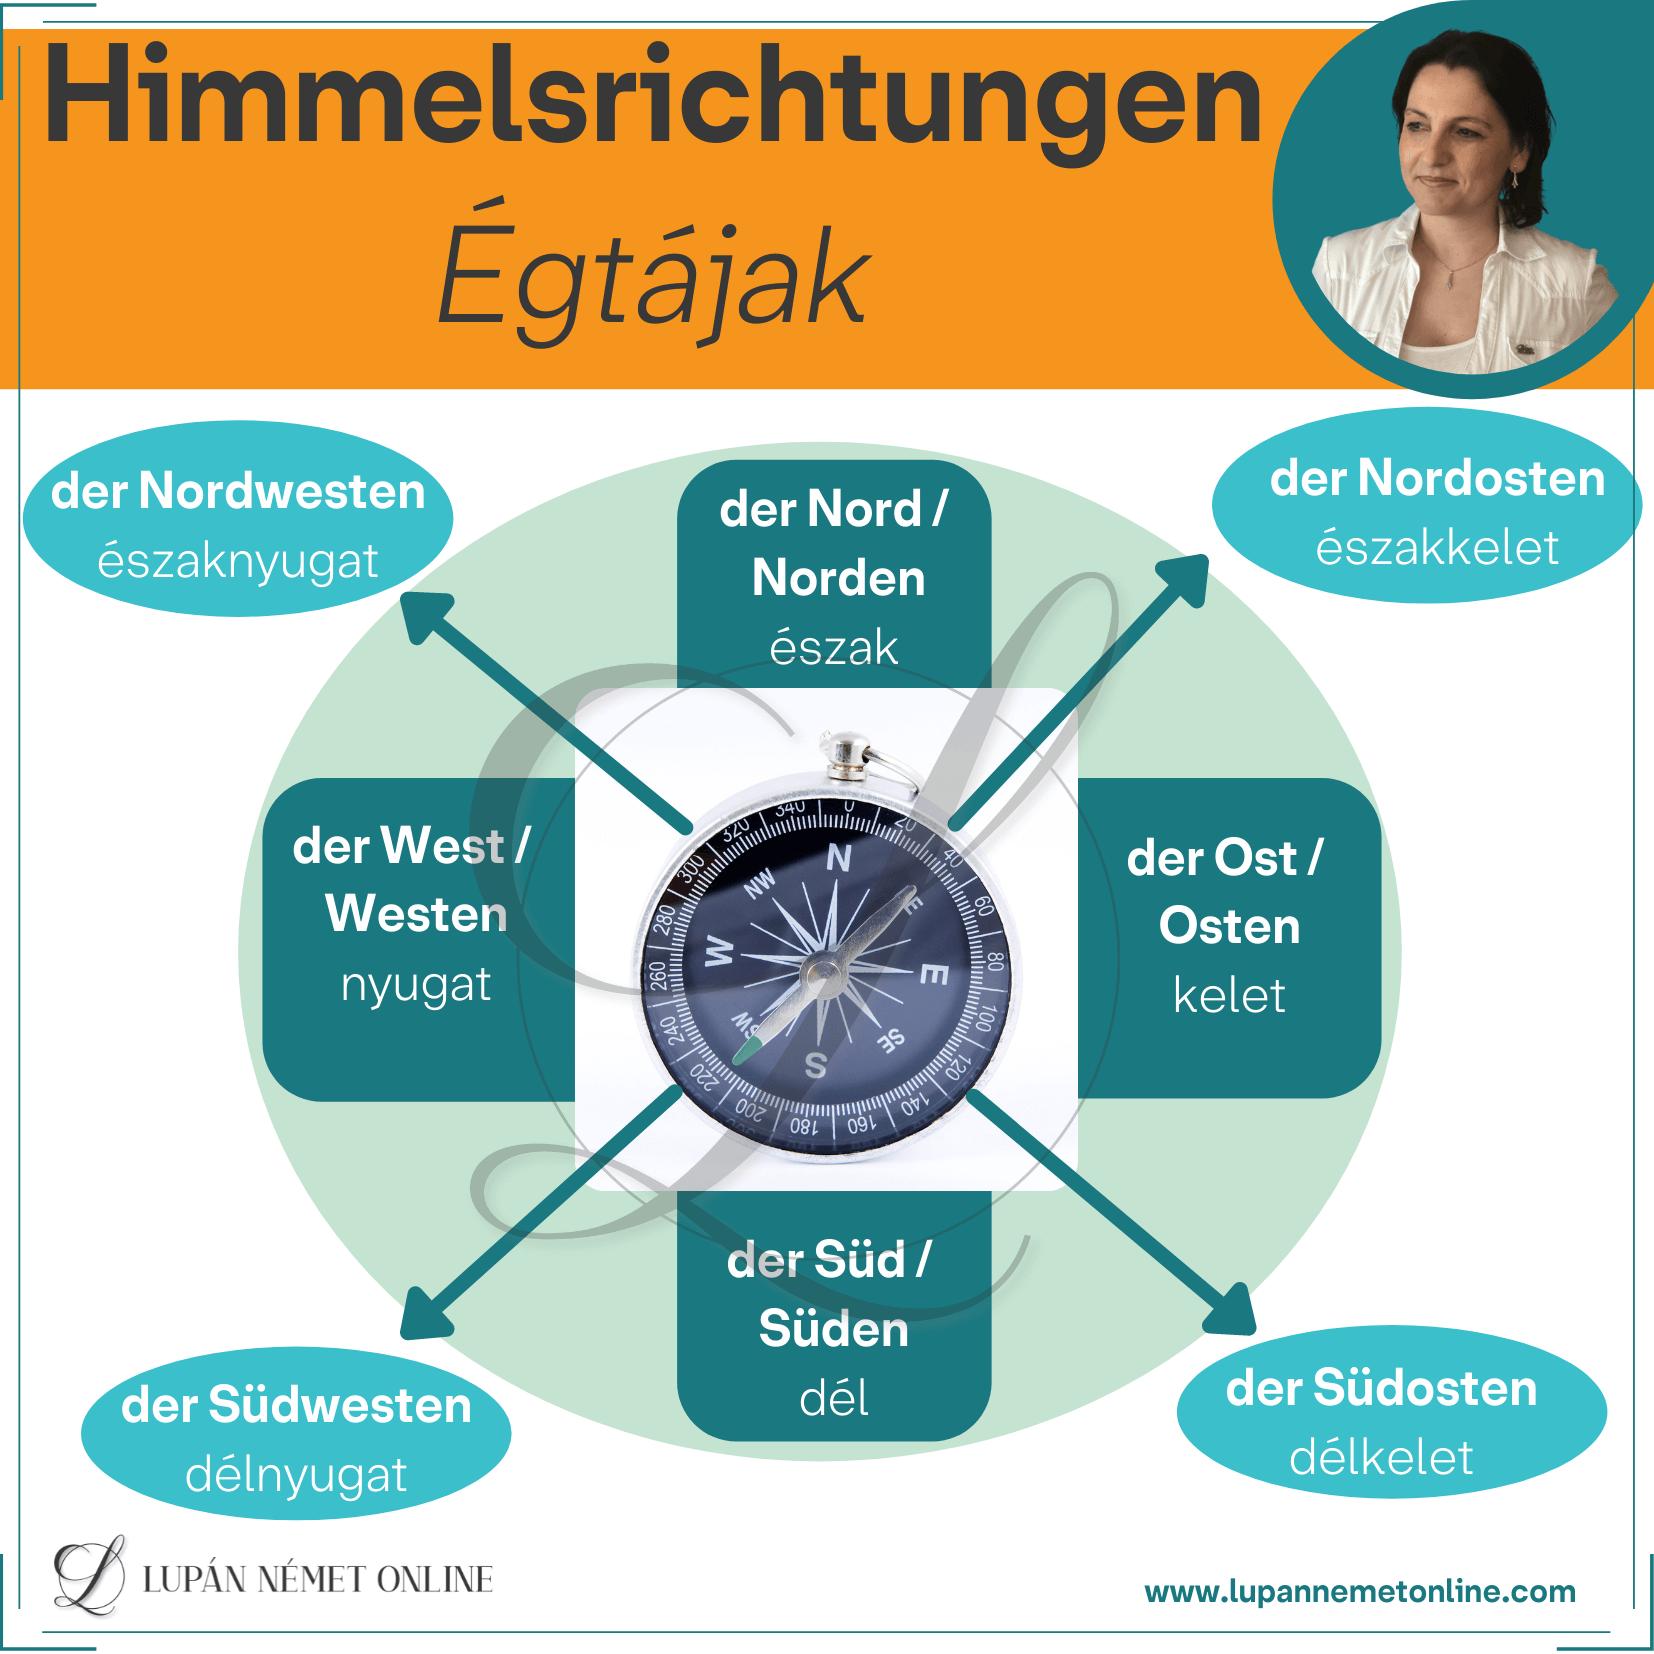 Égtájak_Himmelsrichtungen